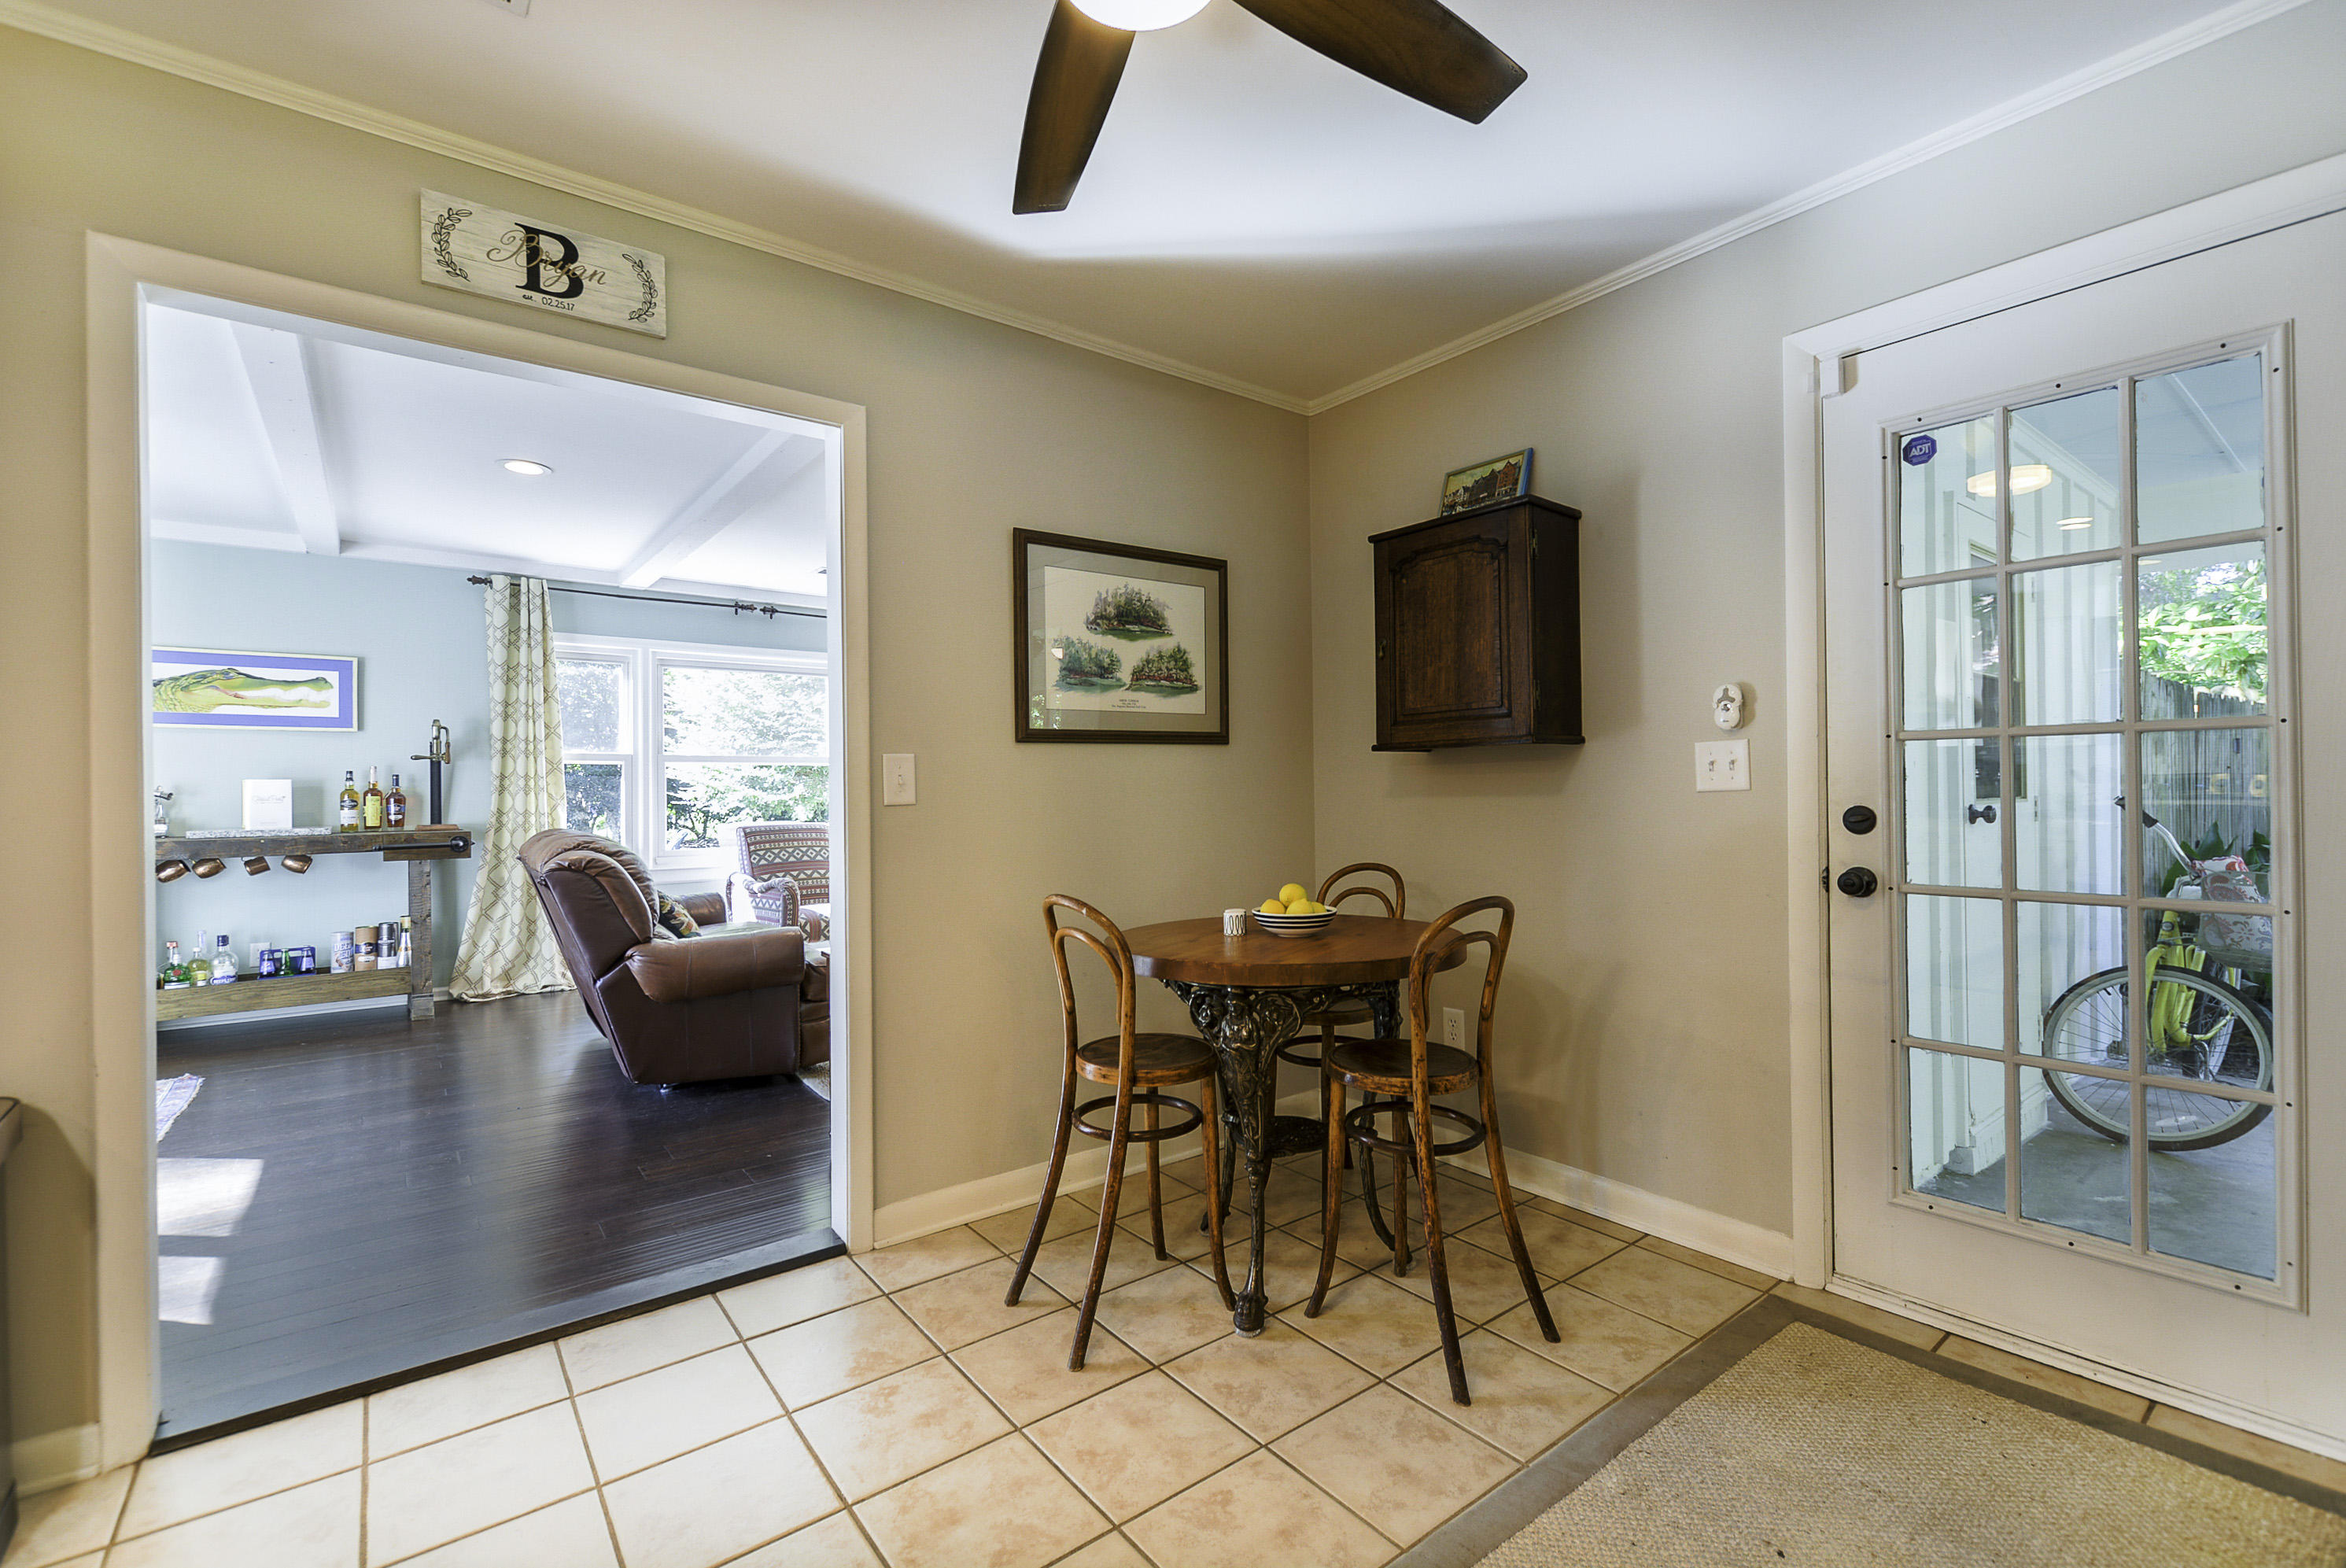 Avian Park Homes For Sale - 1212 Penny, Mount Pleasant, SC - 6